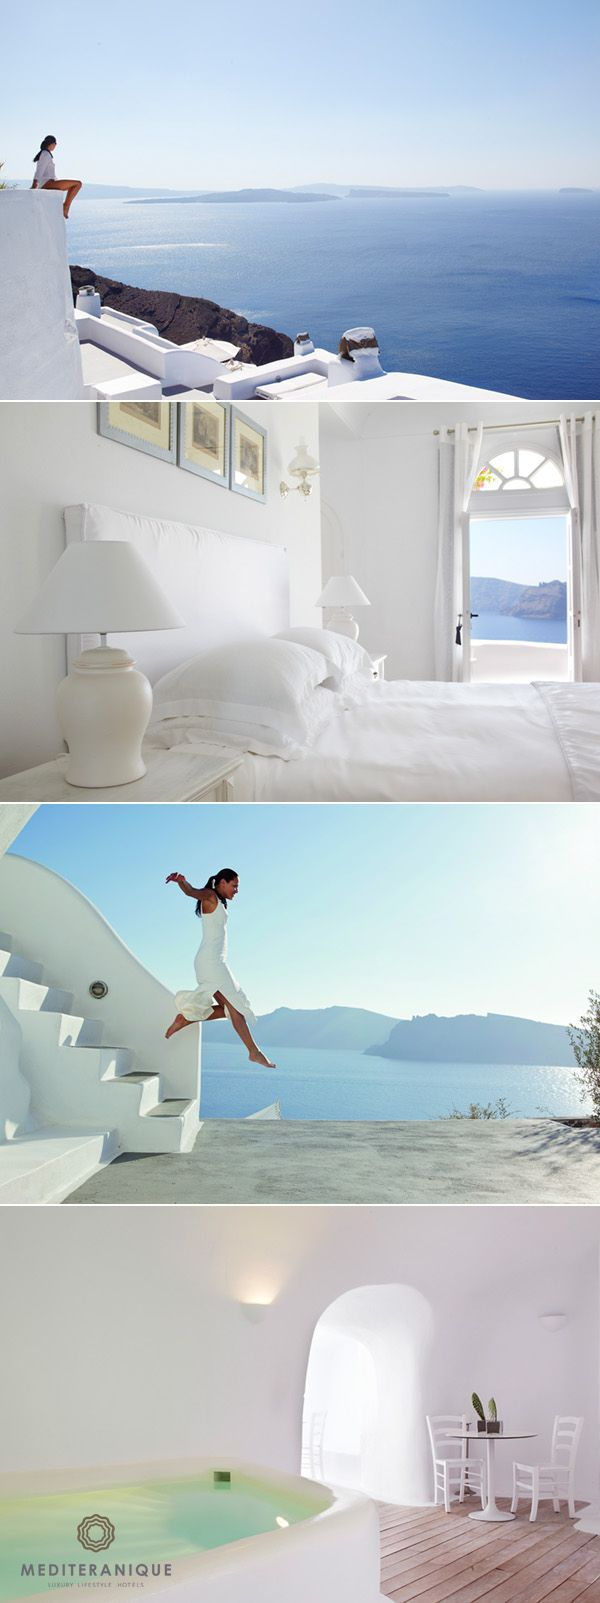 Kirini Suites & Spa, Santorini, Greece http://www.mediteranique.com/hotels-greece/santorini/kirini-suites-spa/